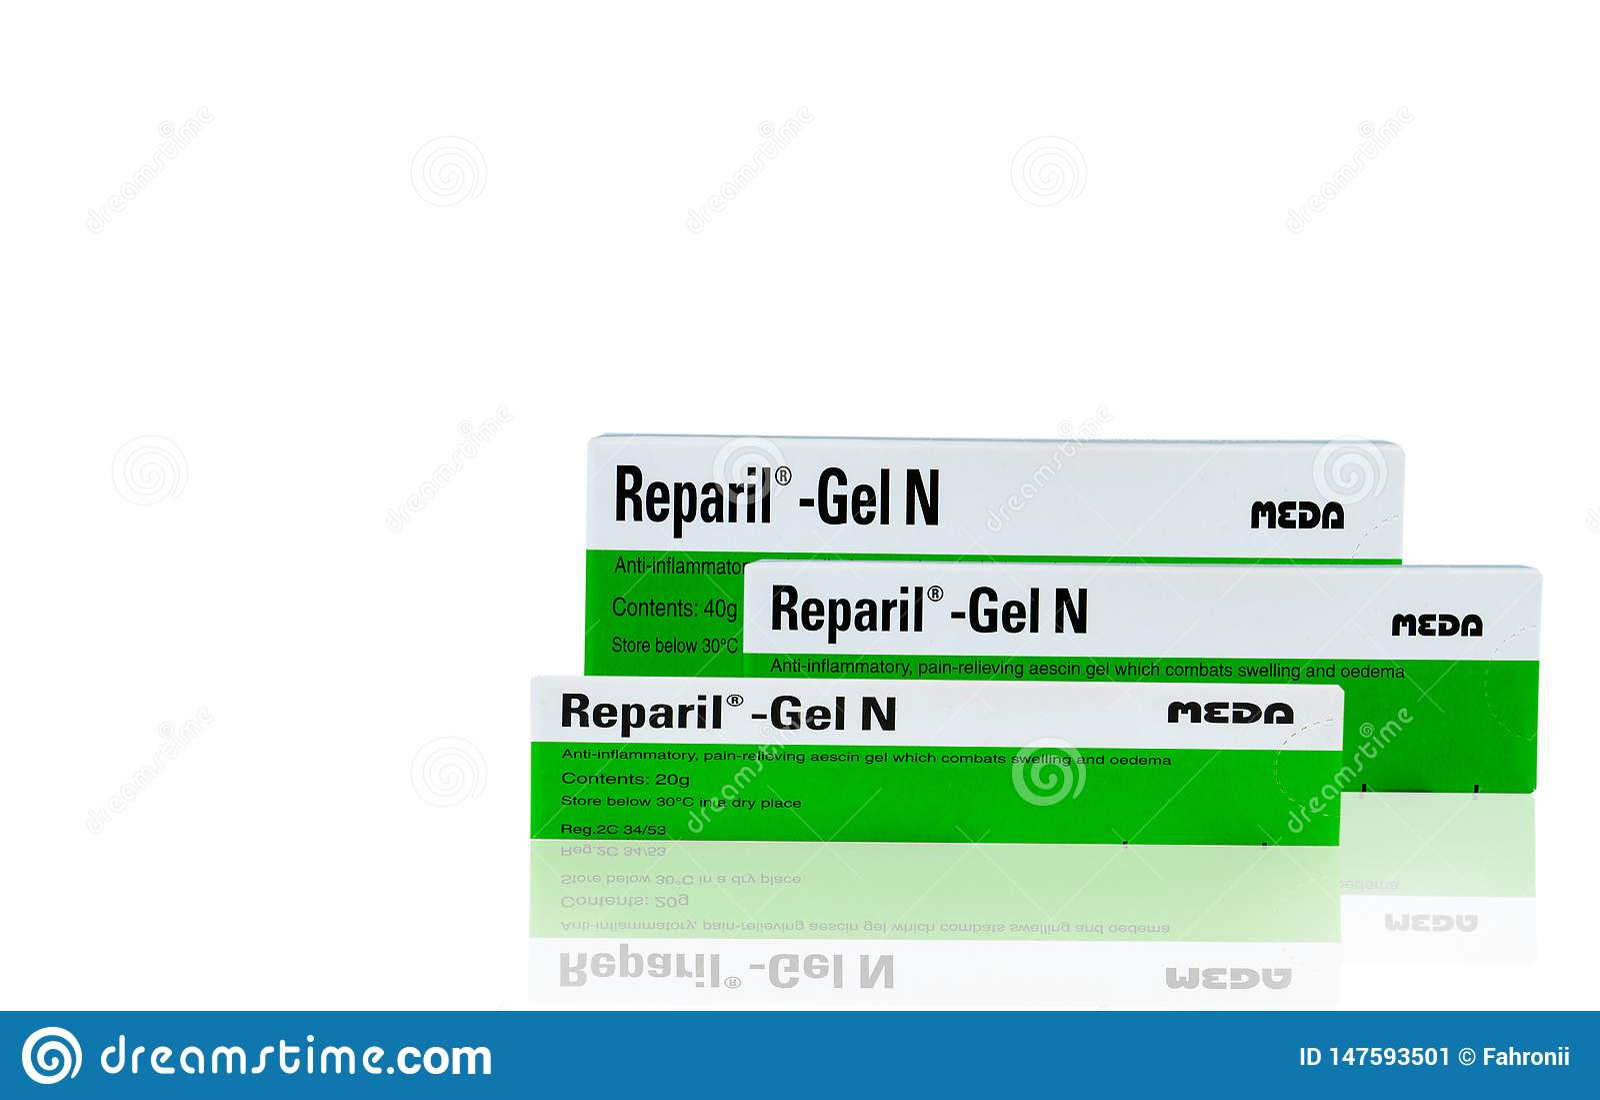 Reparil胶凝体N Aescin和二乙胺水杨酸胶凝体安多激动的,解除与膨胀交战的aescin胶凝体的痛苦